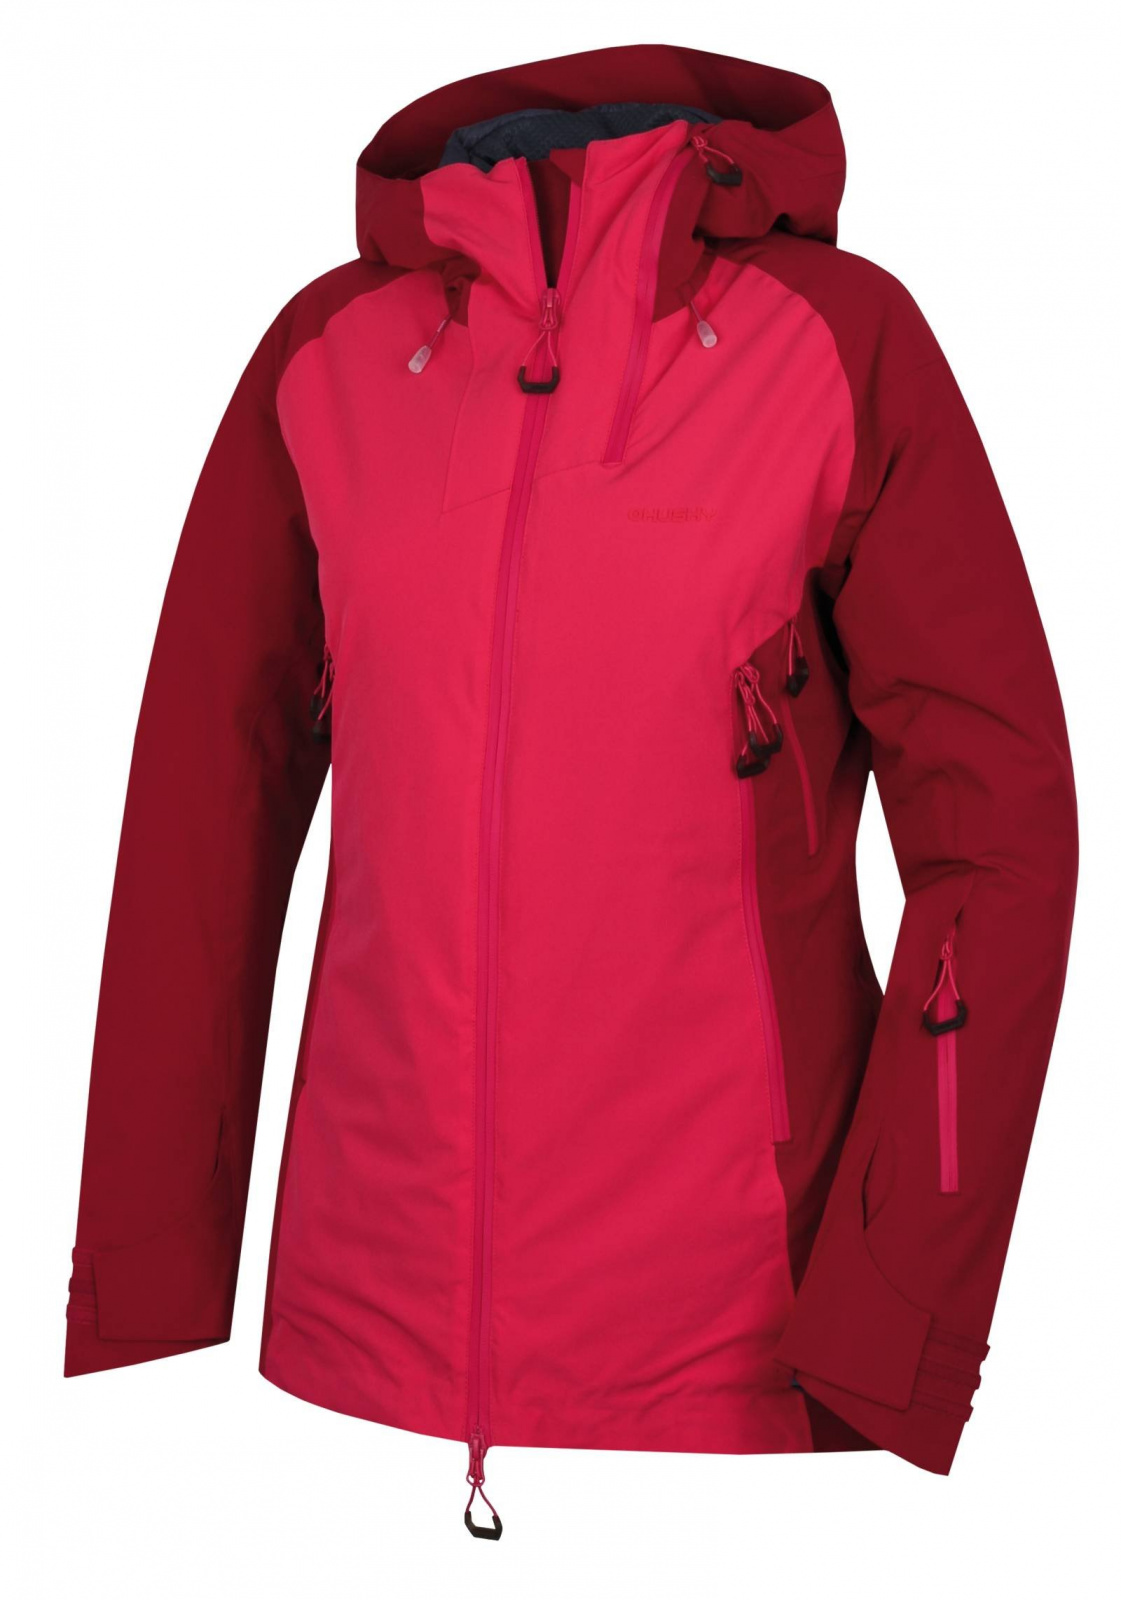 Husky Gambola L purpurová / ružová, XL Dámska hardshell plnená bunda